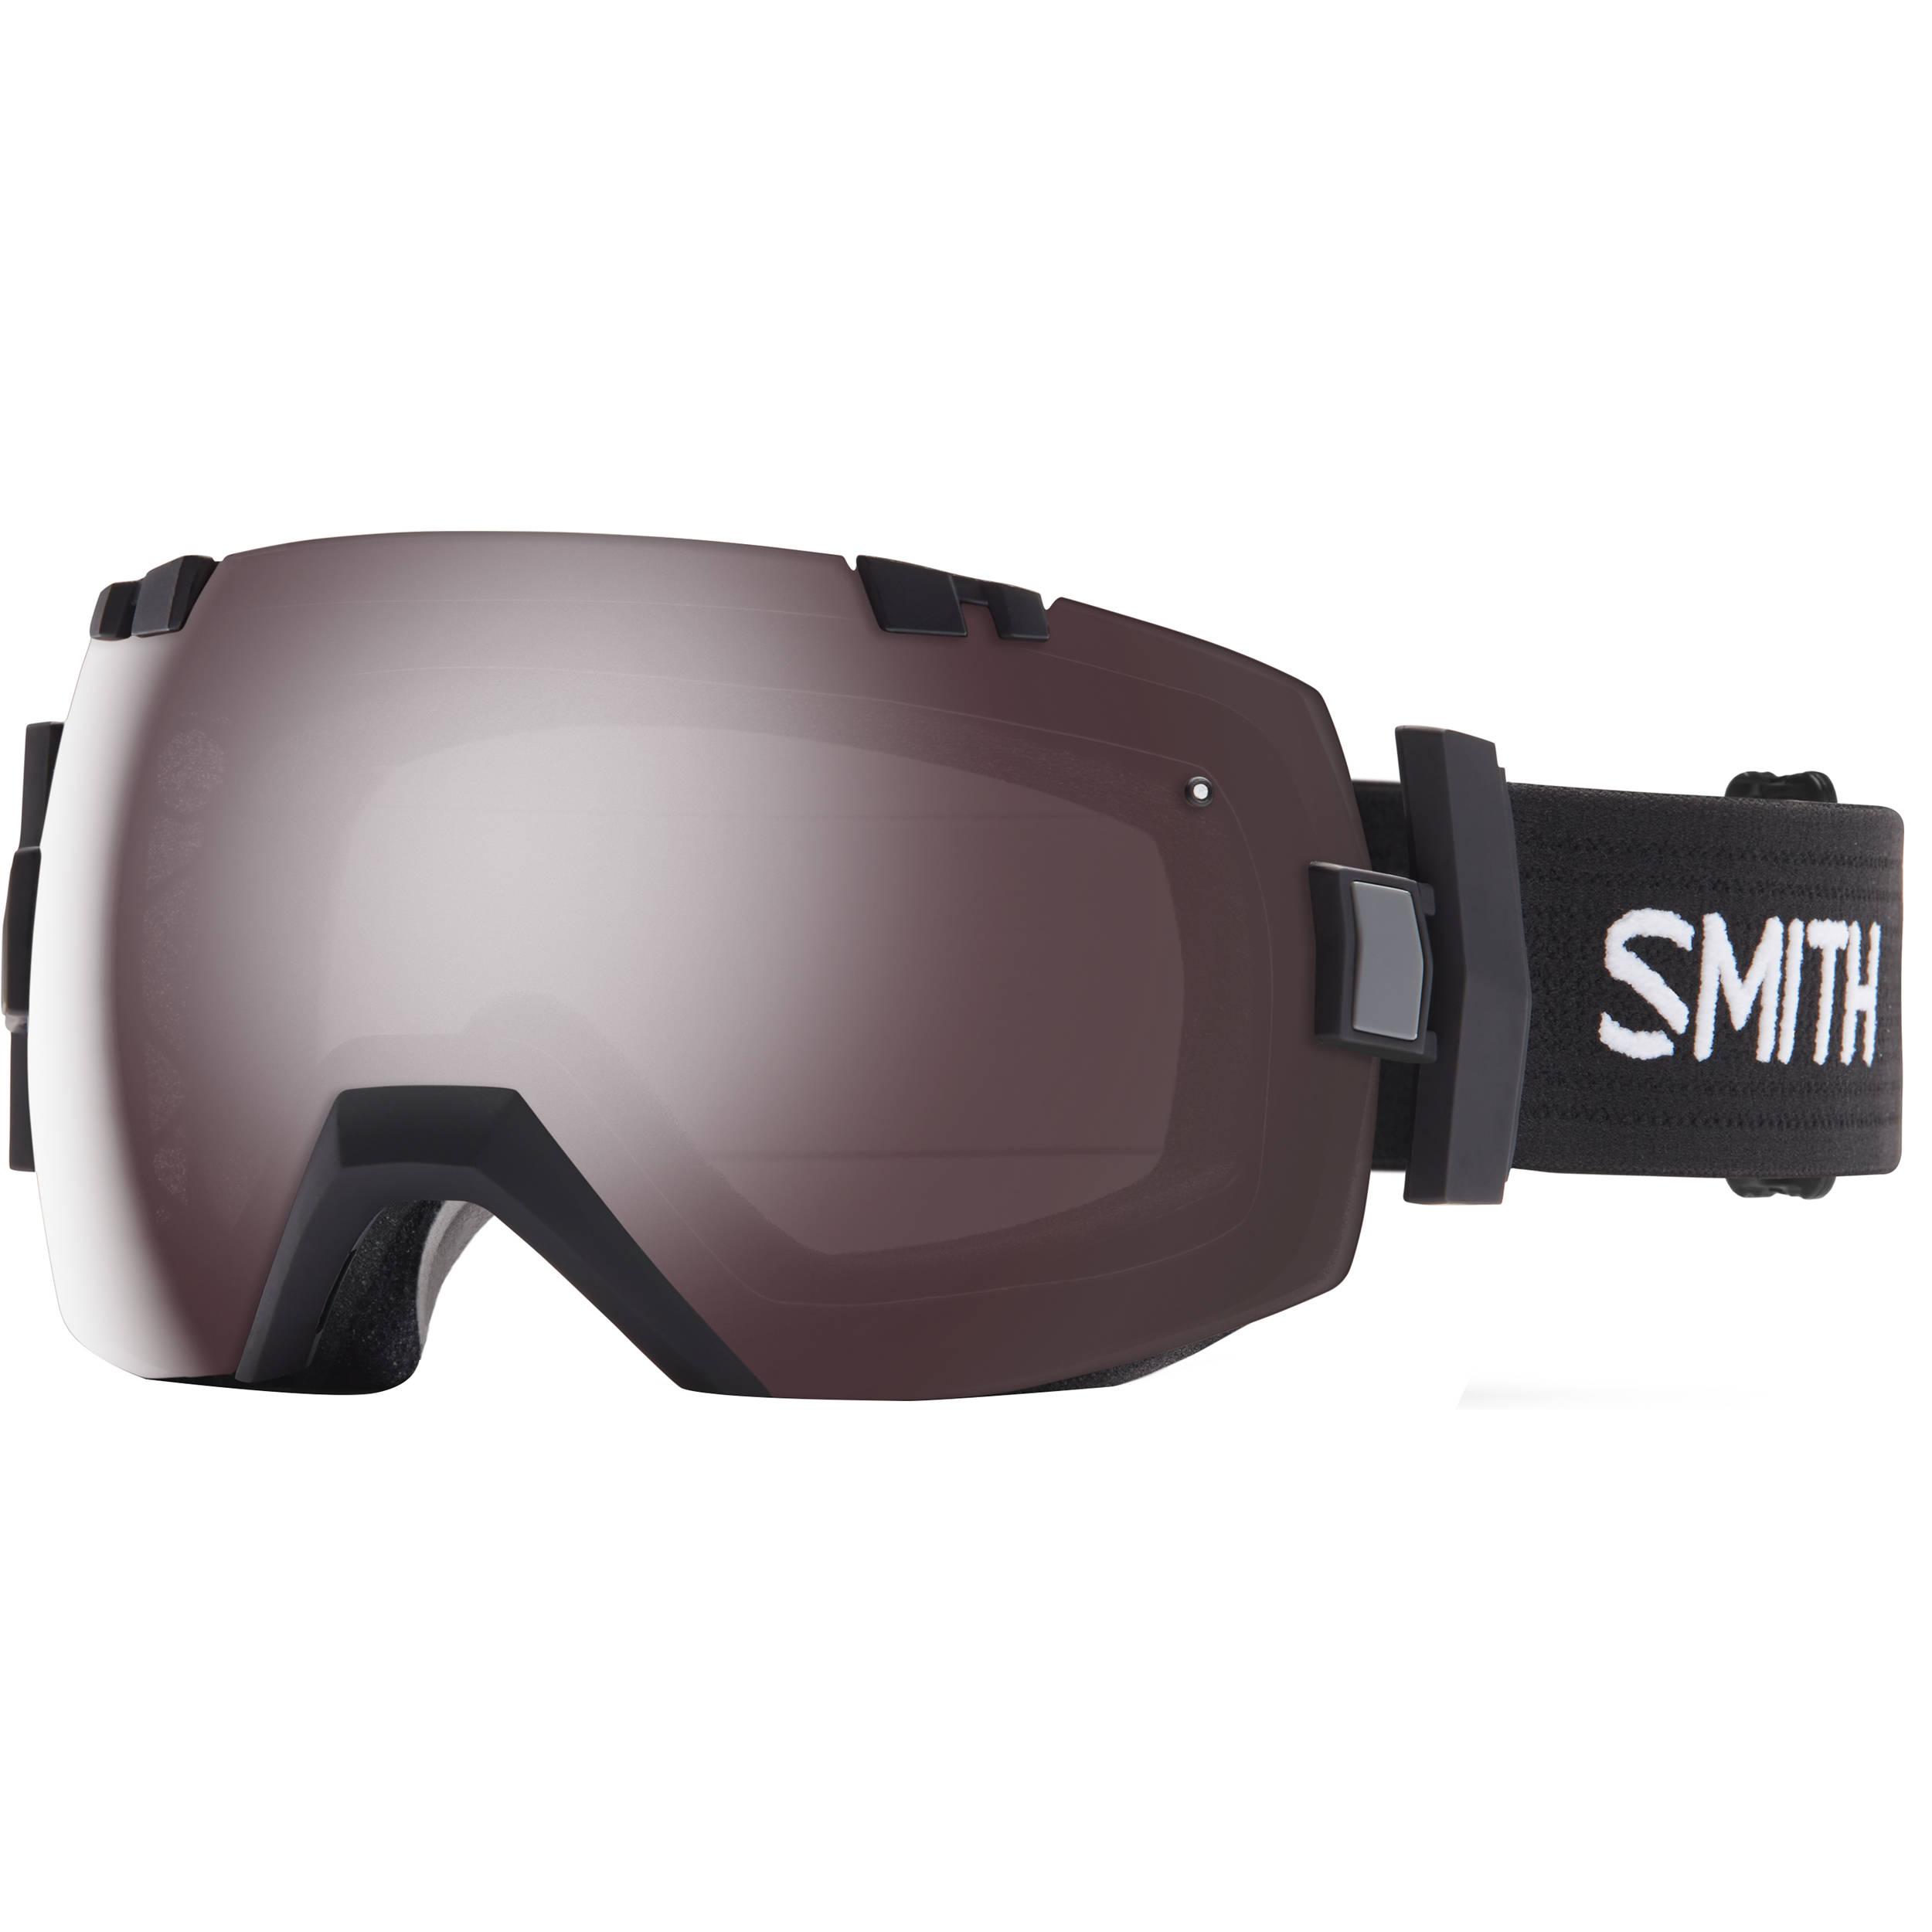 961f4c96eda1 Smith Optics Medium Large-Fit I O X Snow Goggle IL7IBK16 B H